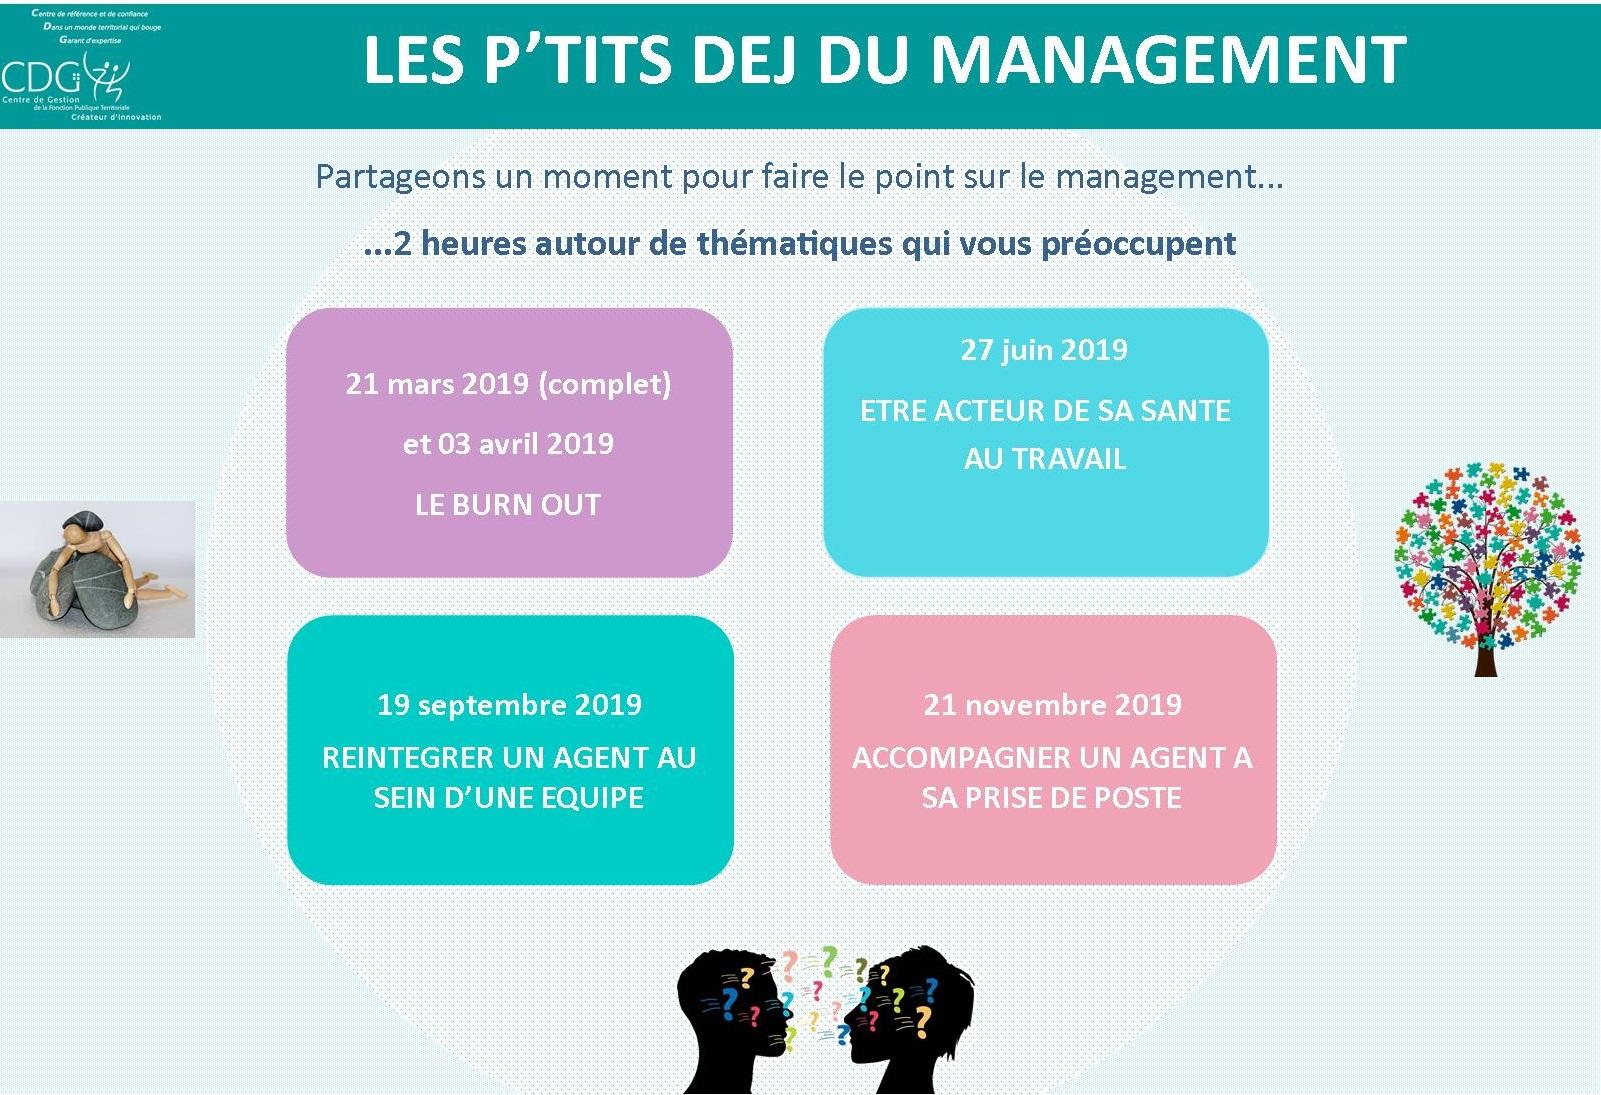 ptit_dej_du_management.jpg